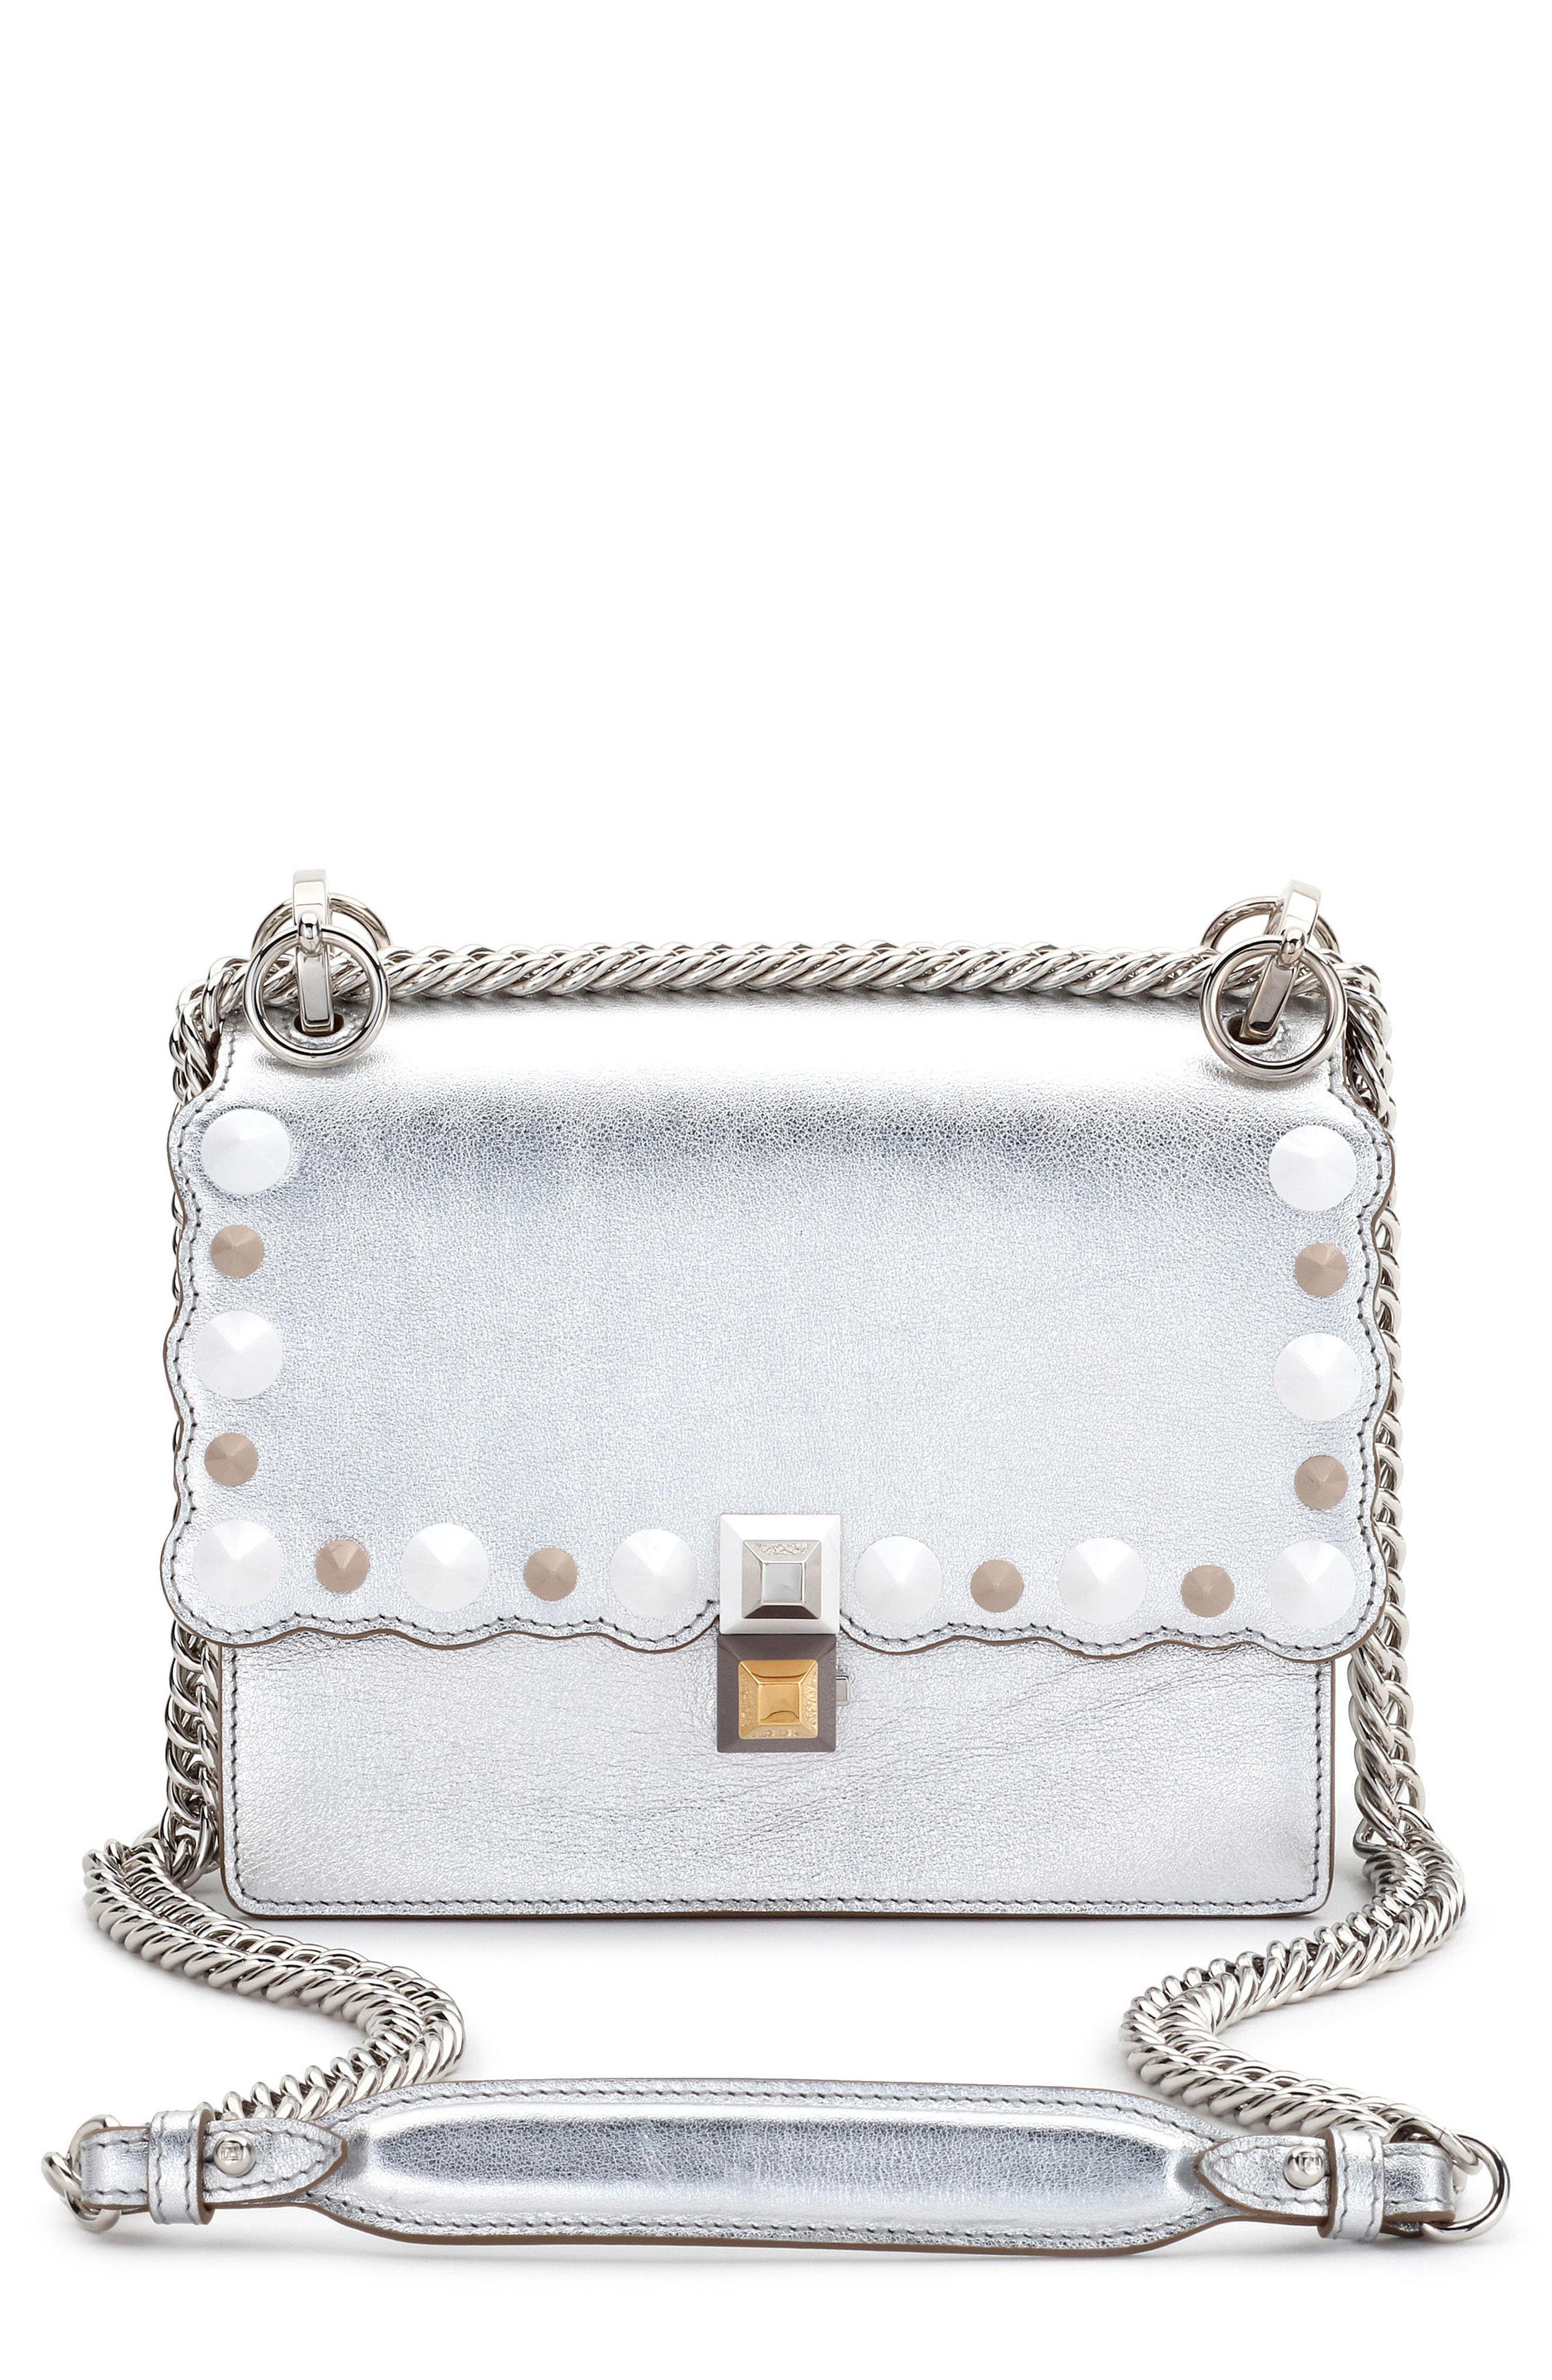 Lyst - Fendi Small Kan I Metallic Leather Shoulder Bag - in Metallic ... 7368a935b3f9c